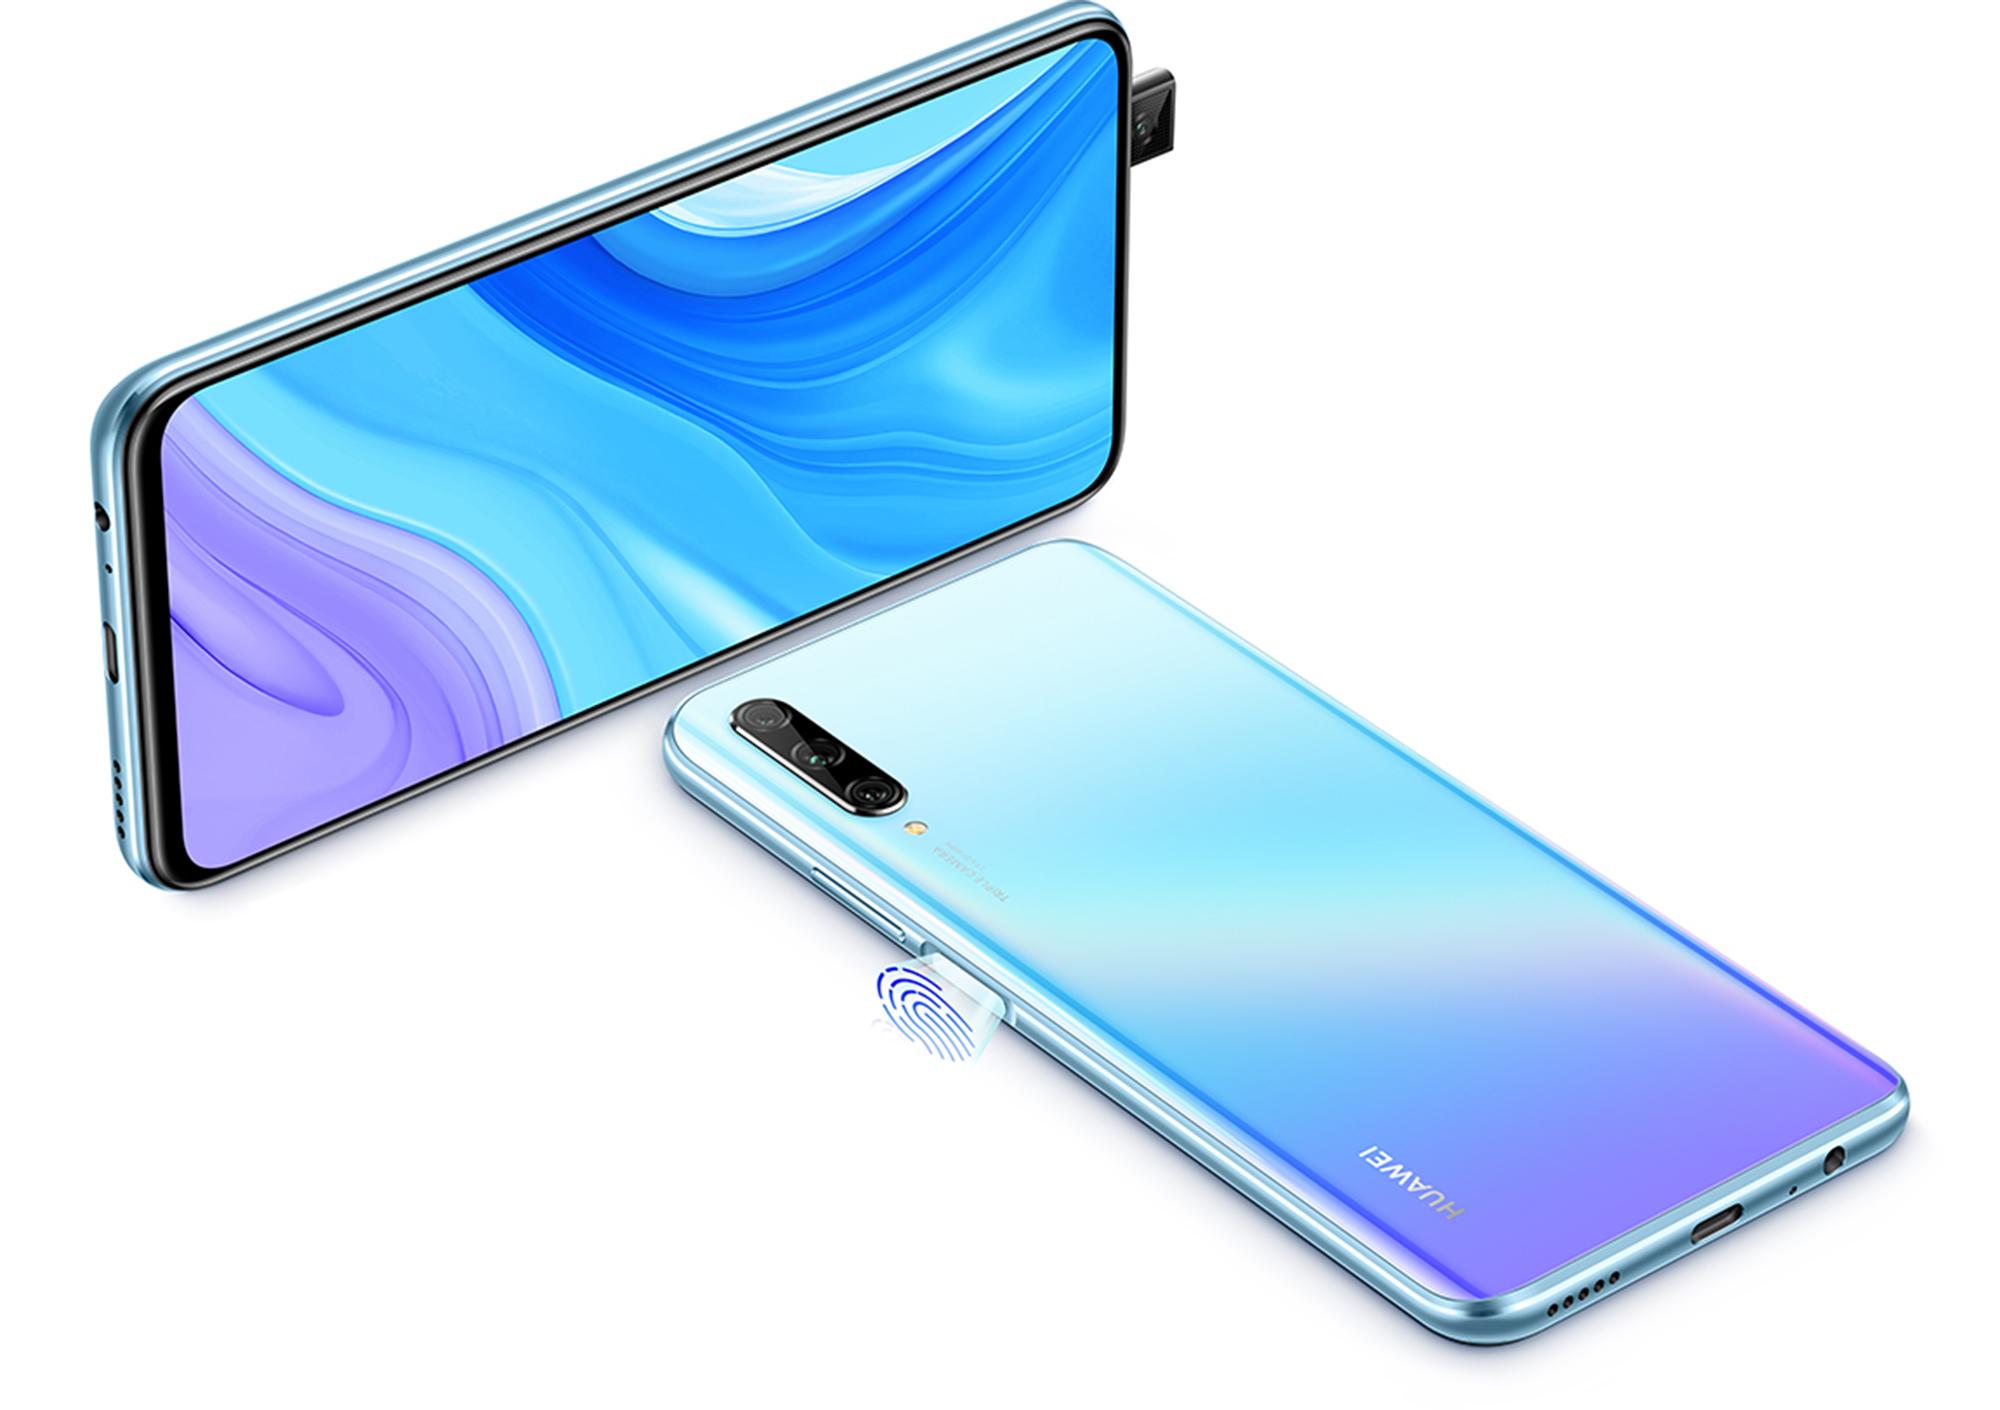 Kamera und FIngerabdrucksensor des Huawei P Smart Pro